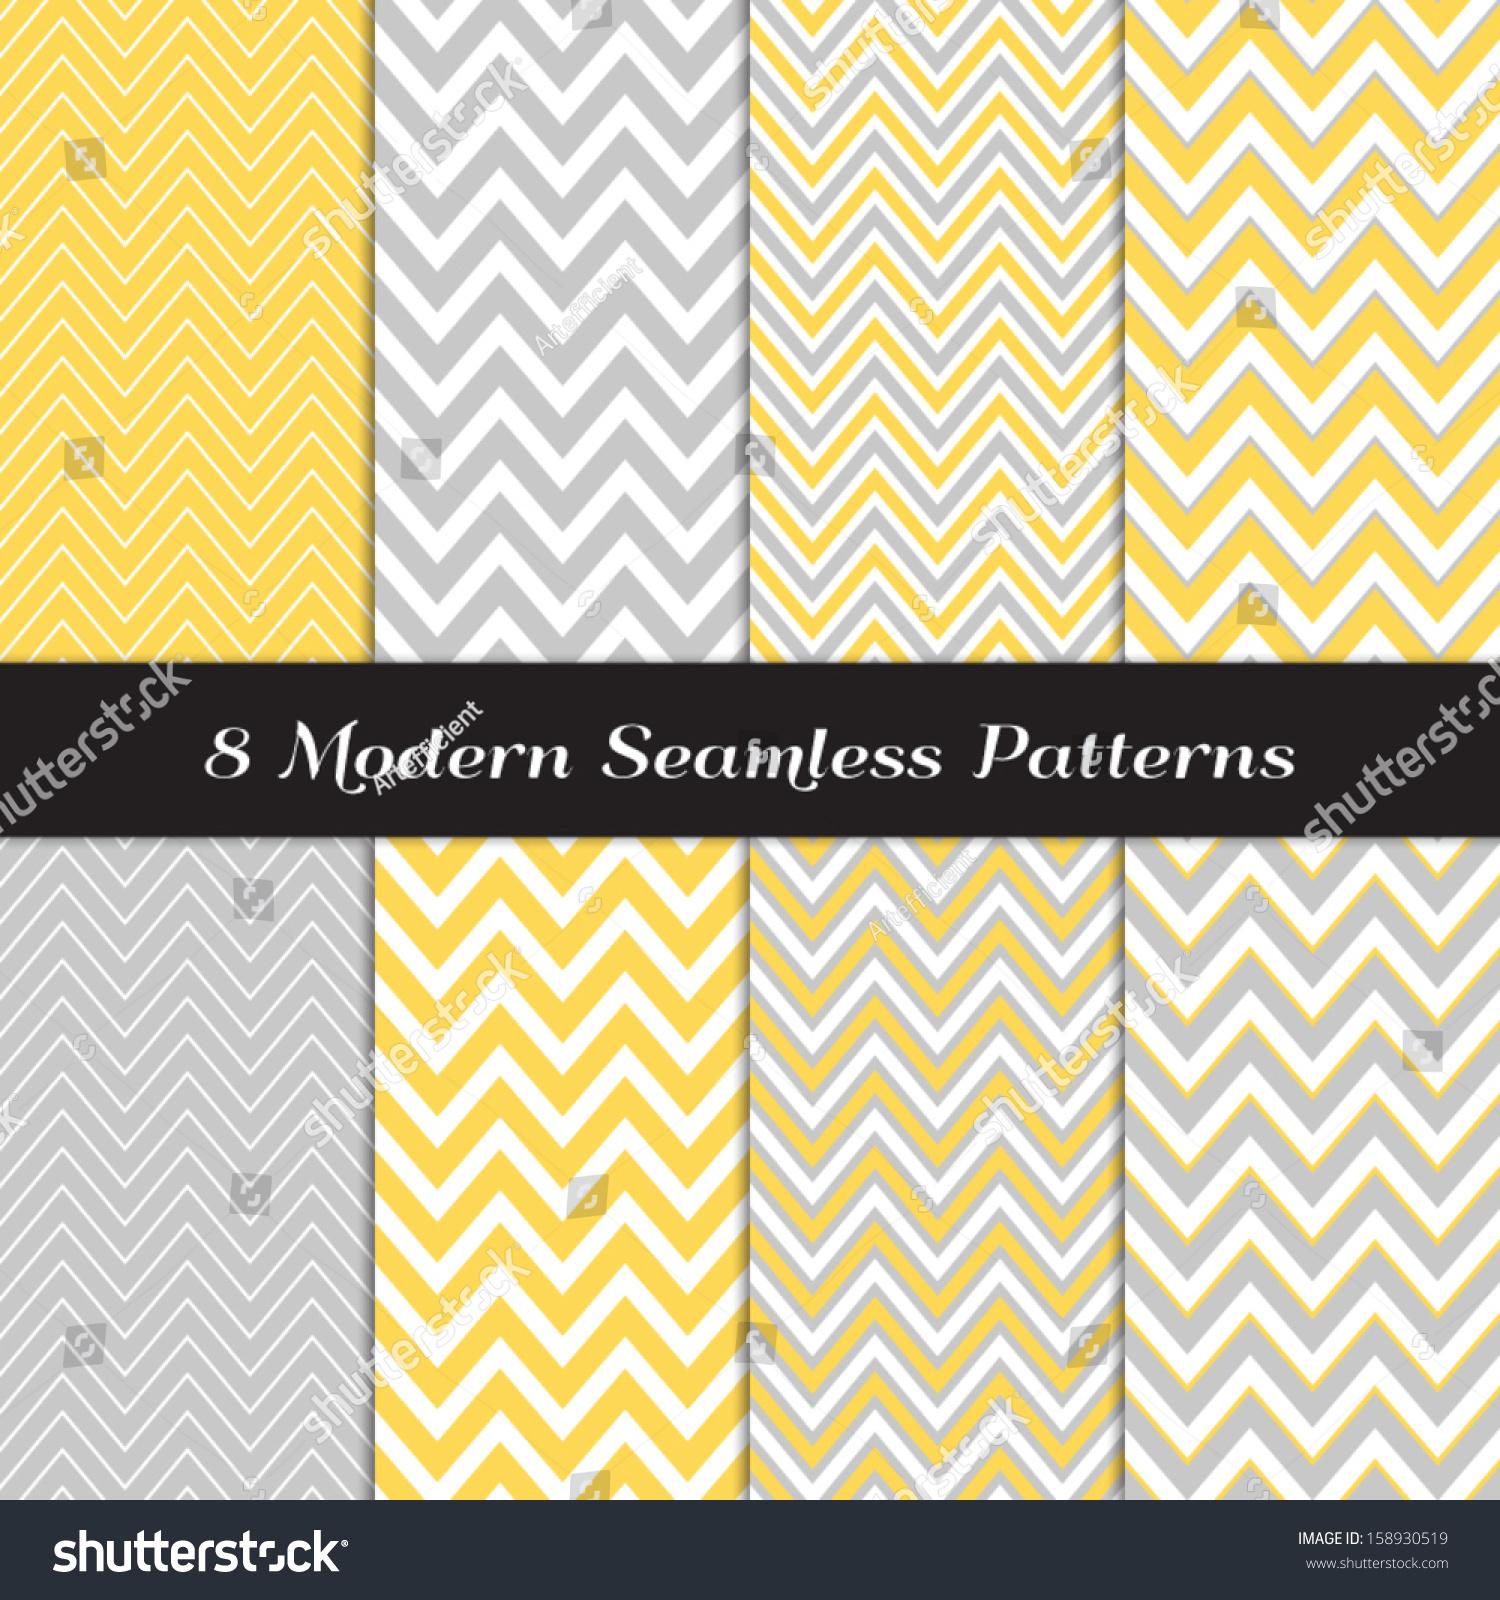 Yellow chevron pattern background